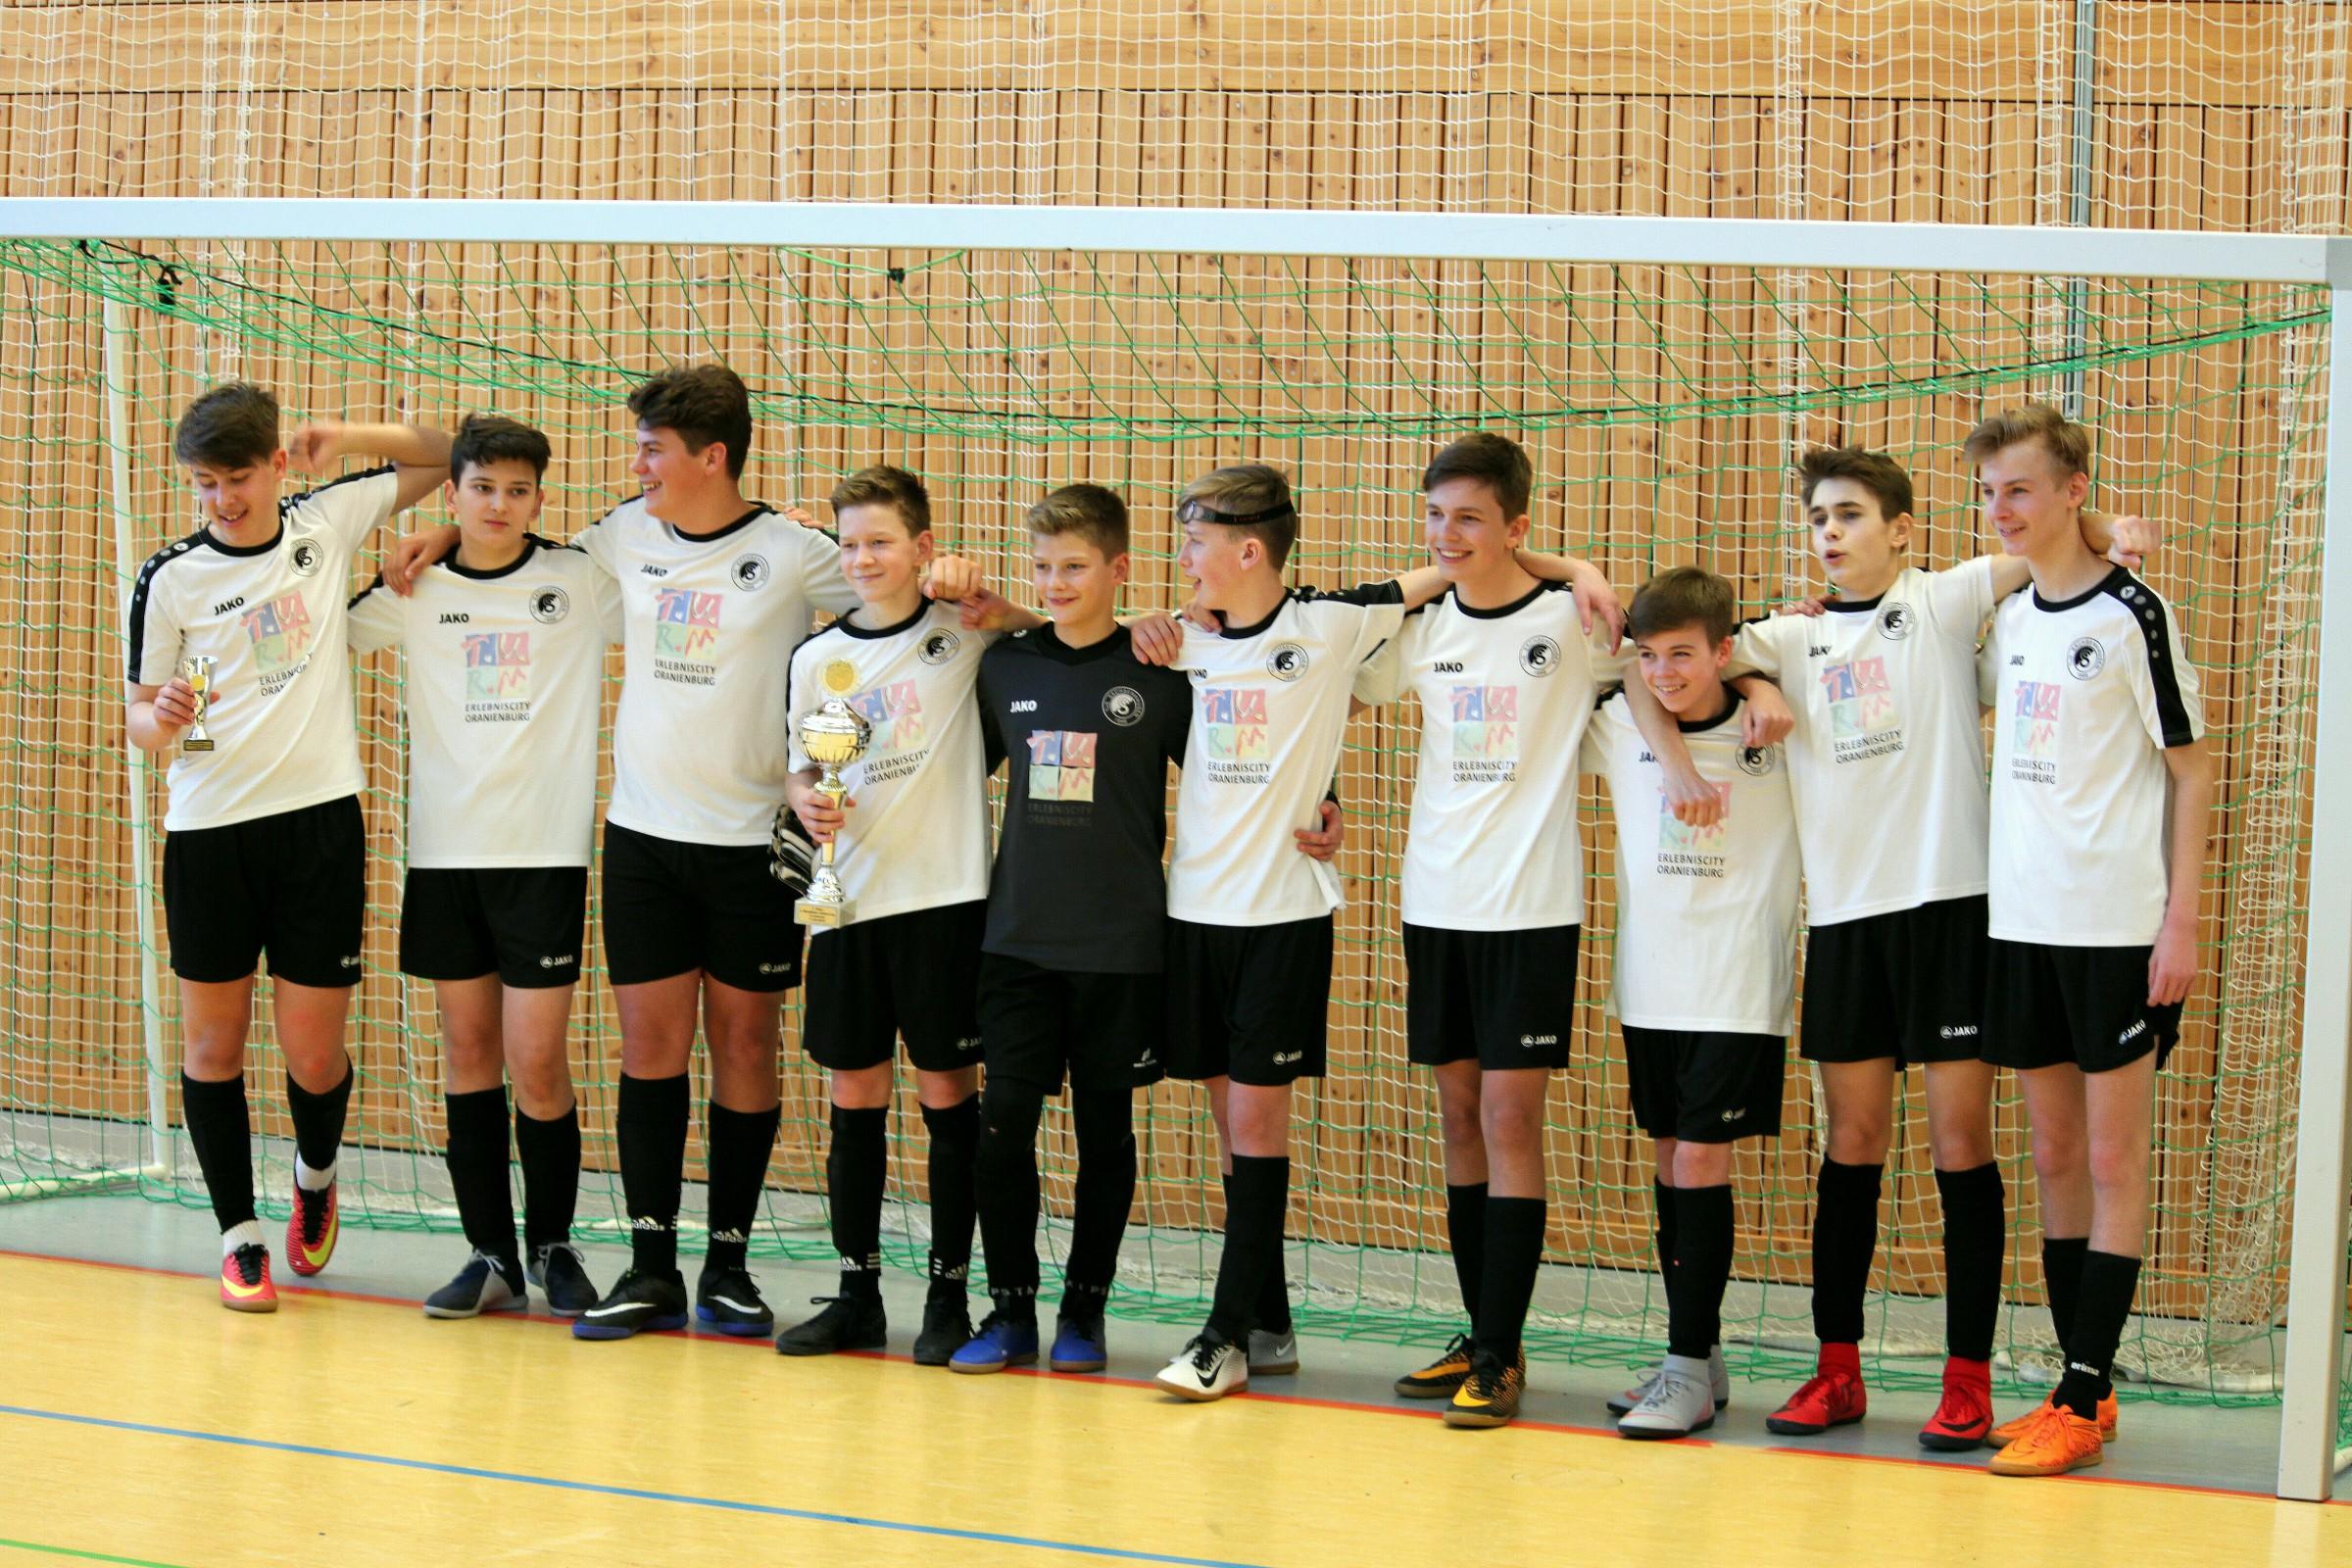 20190217 3. Wandlitzer Hallen-Cup der C-Junioren  (11)